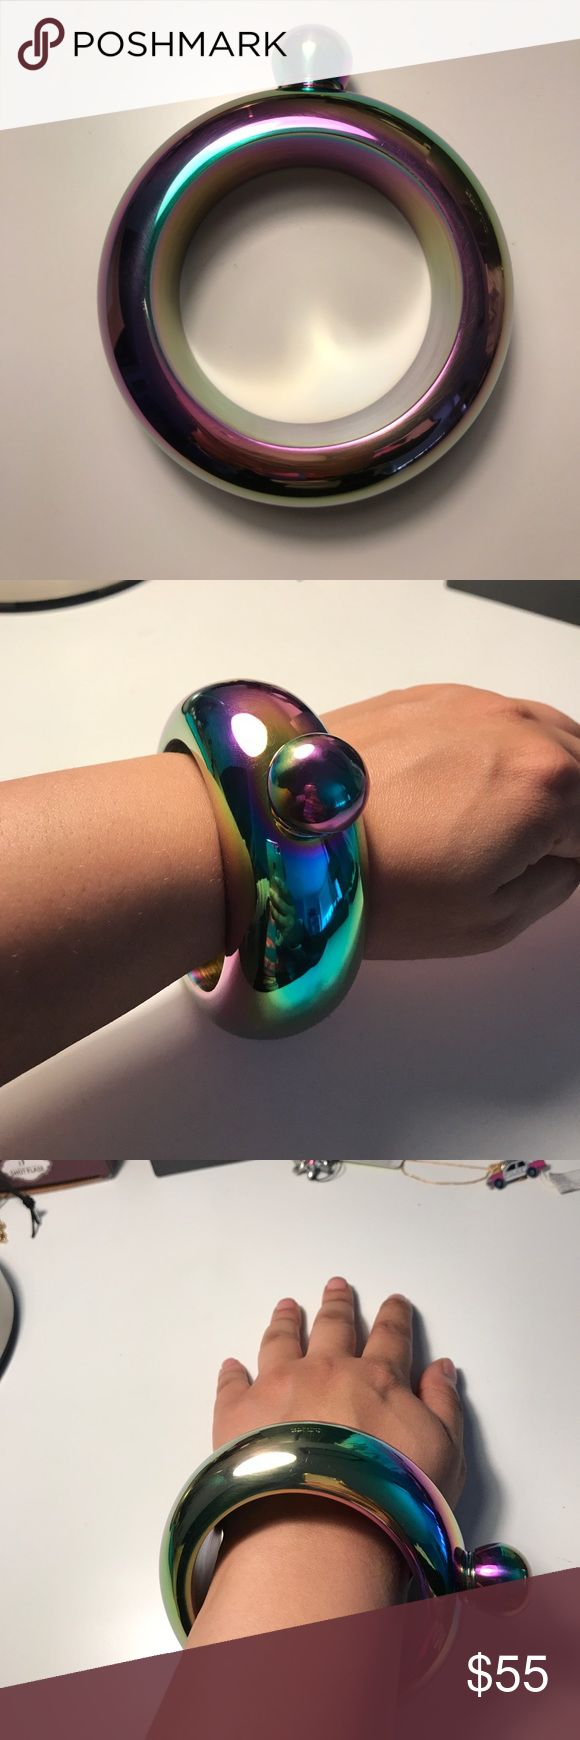 Rainbow Flask Bracelet with funnel Super cute rainbow metal flask bracelet. Funnel included. Holds 3oz of liquid ❗️New in Box❗️ Jewelry Bracelets